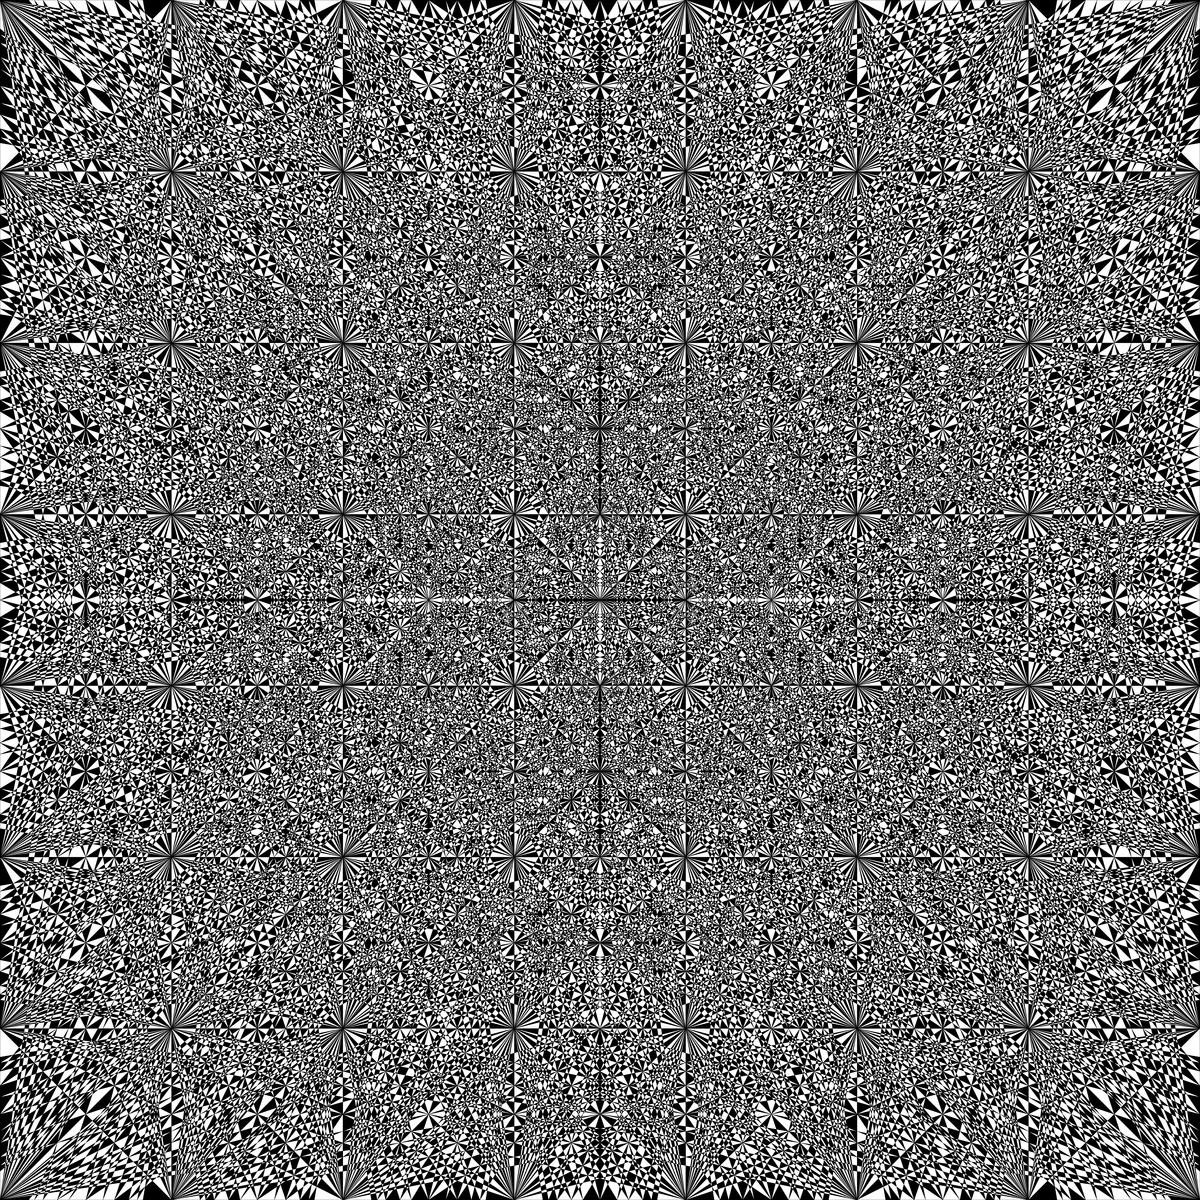 f:id:Hassium277:20200218213950p:plain